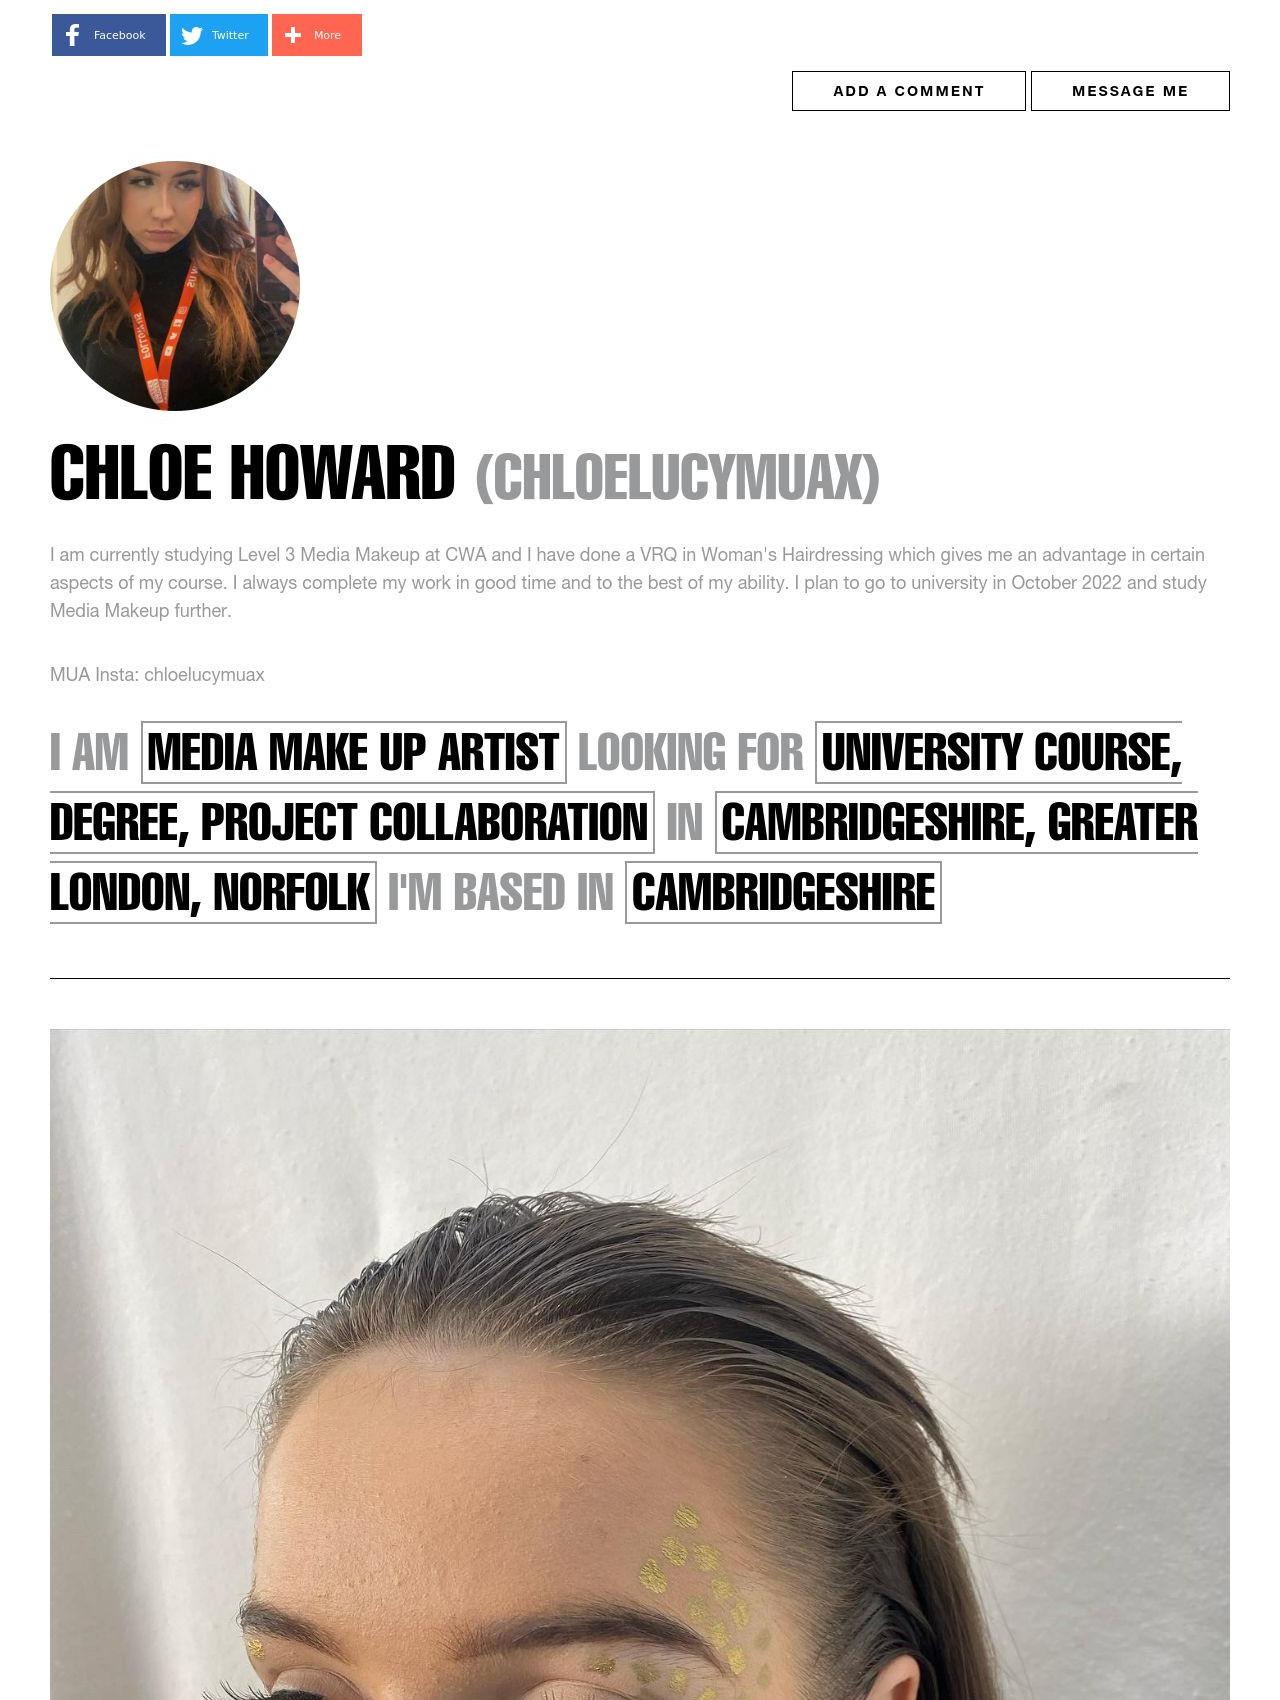 Chloe Howard